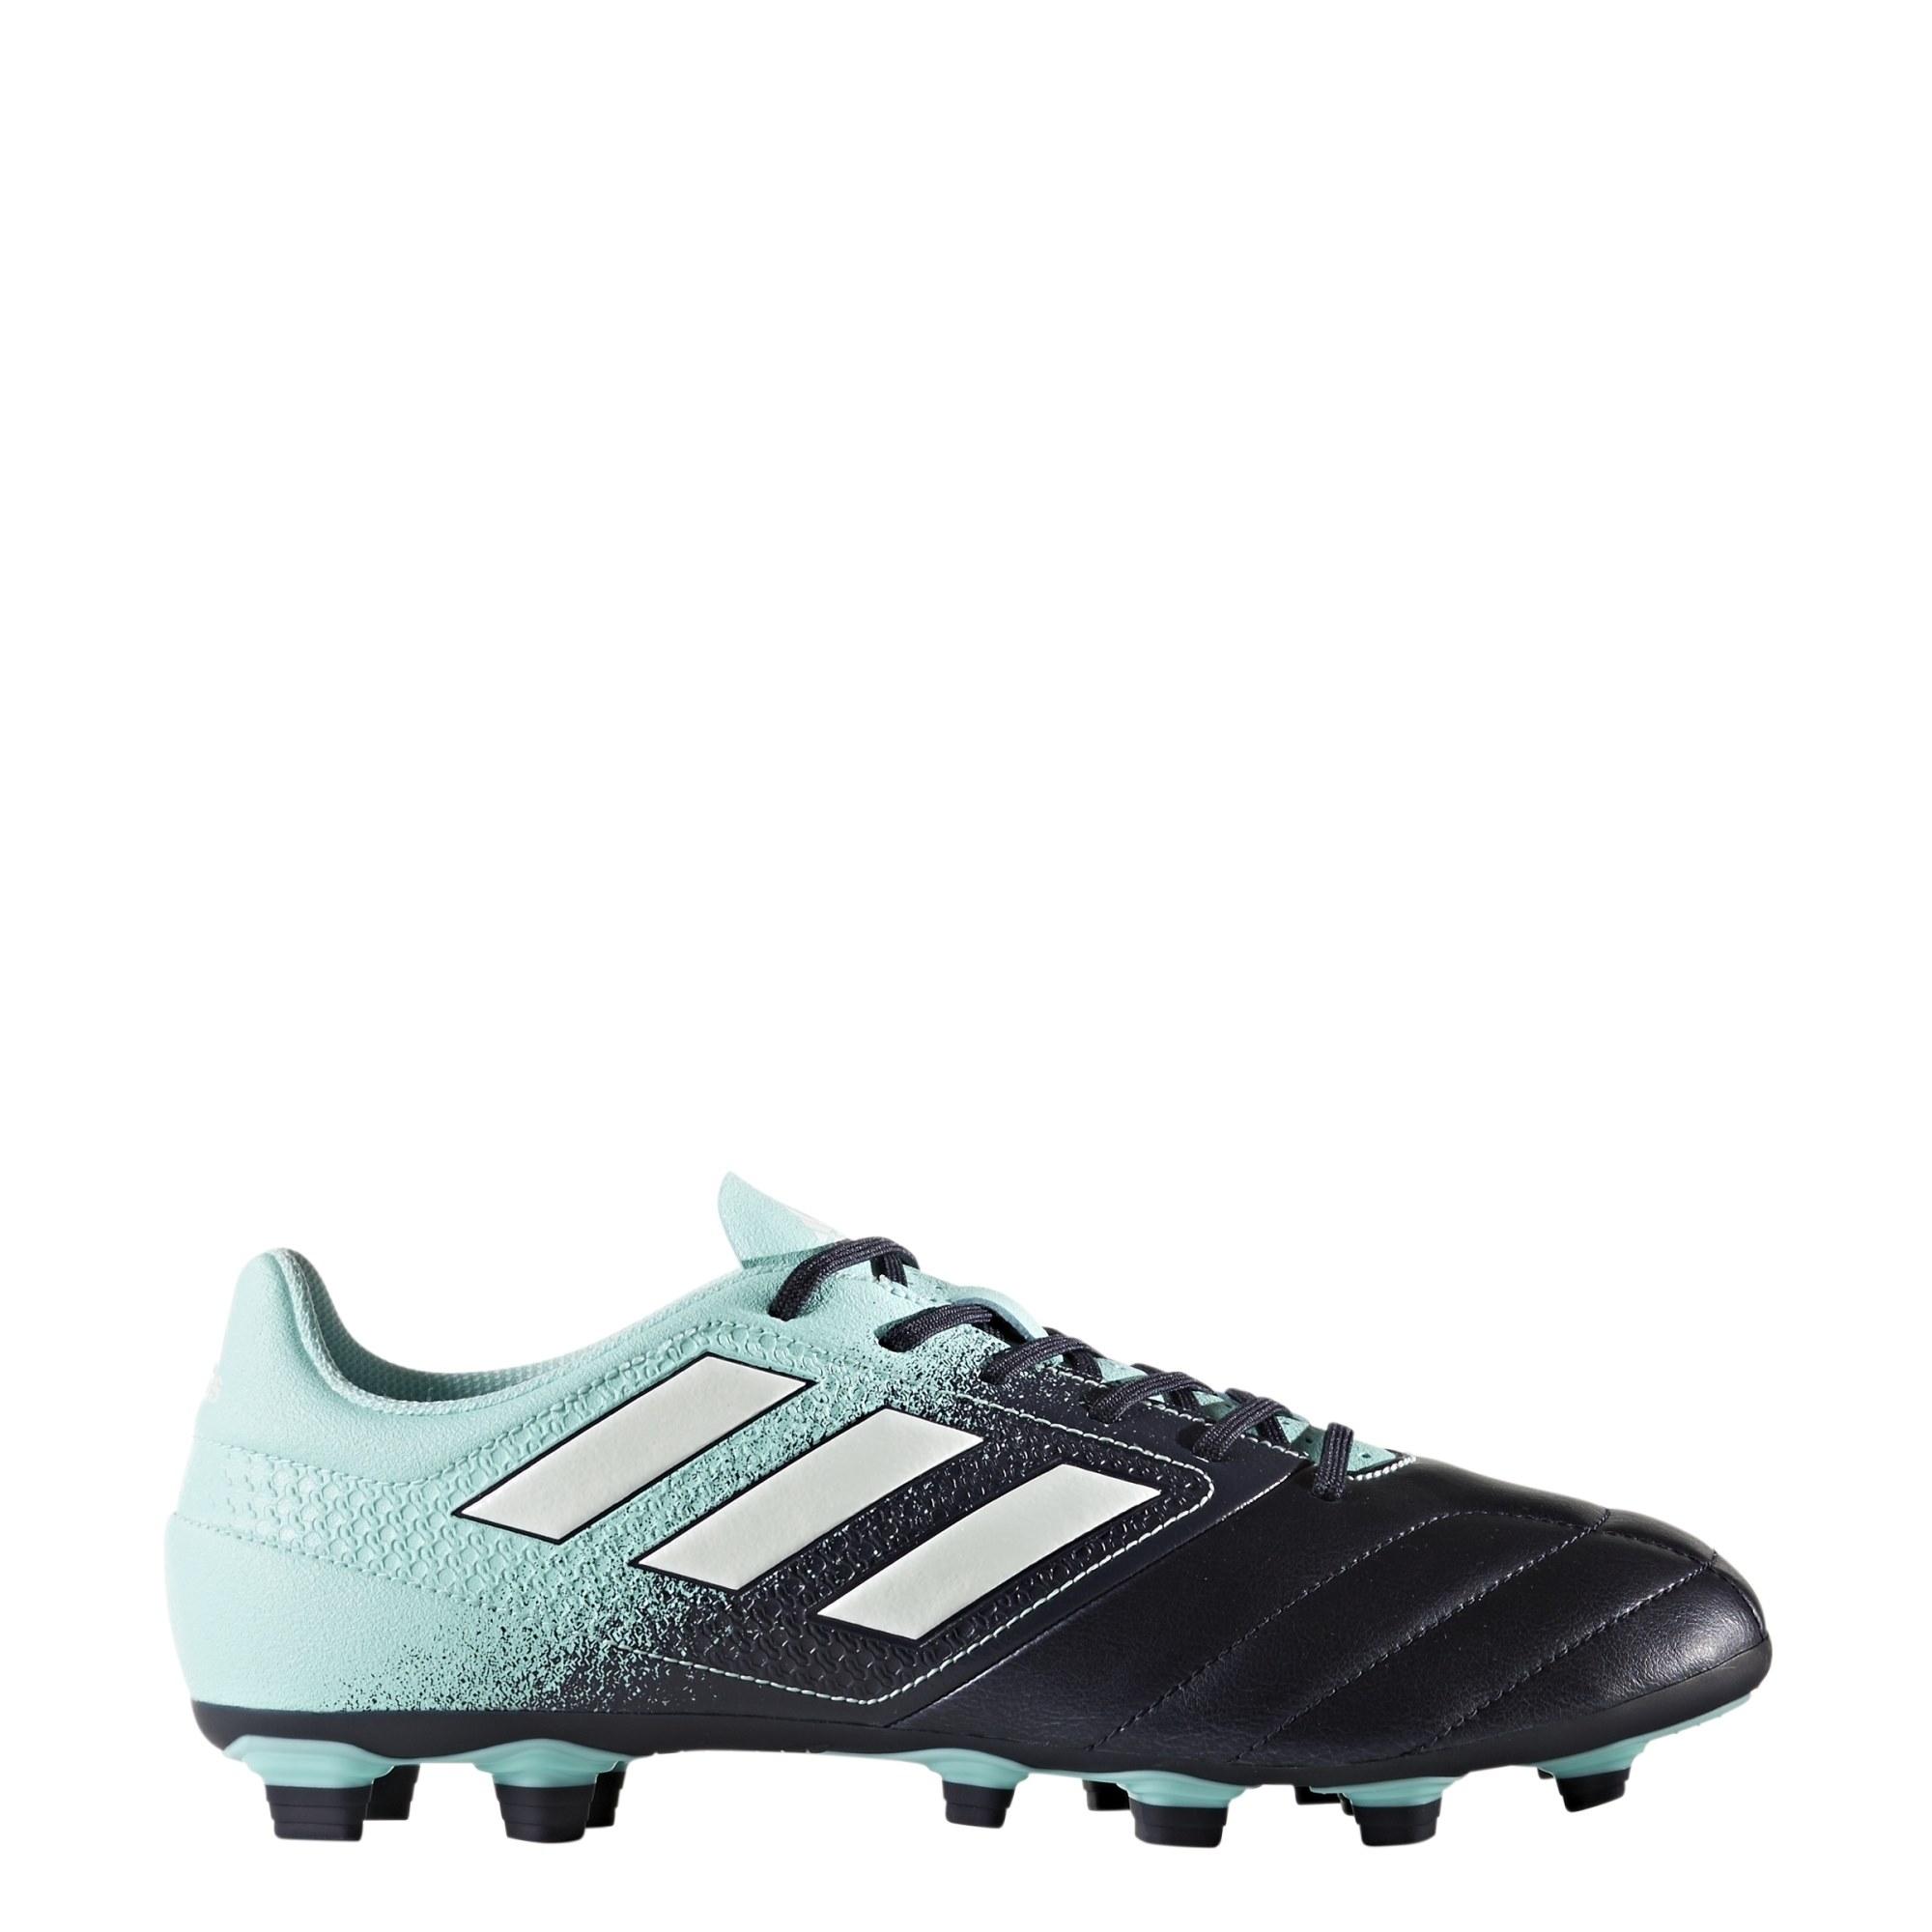 Adidas Ace 17.4 fg Voetbalschoenen